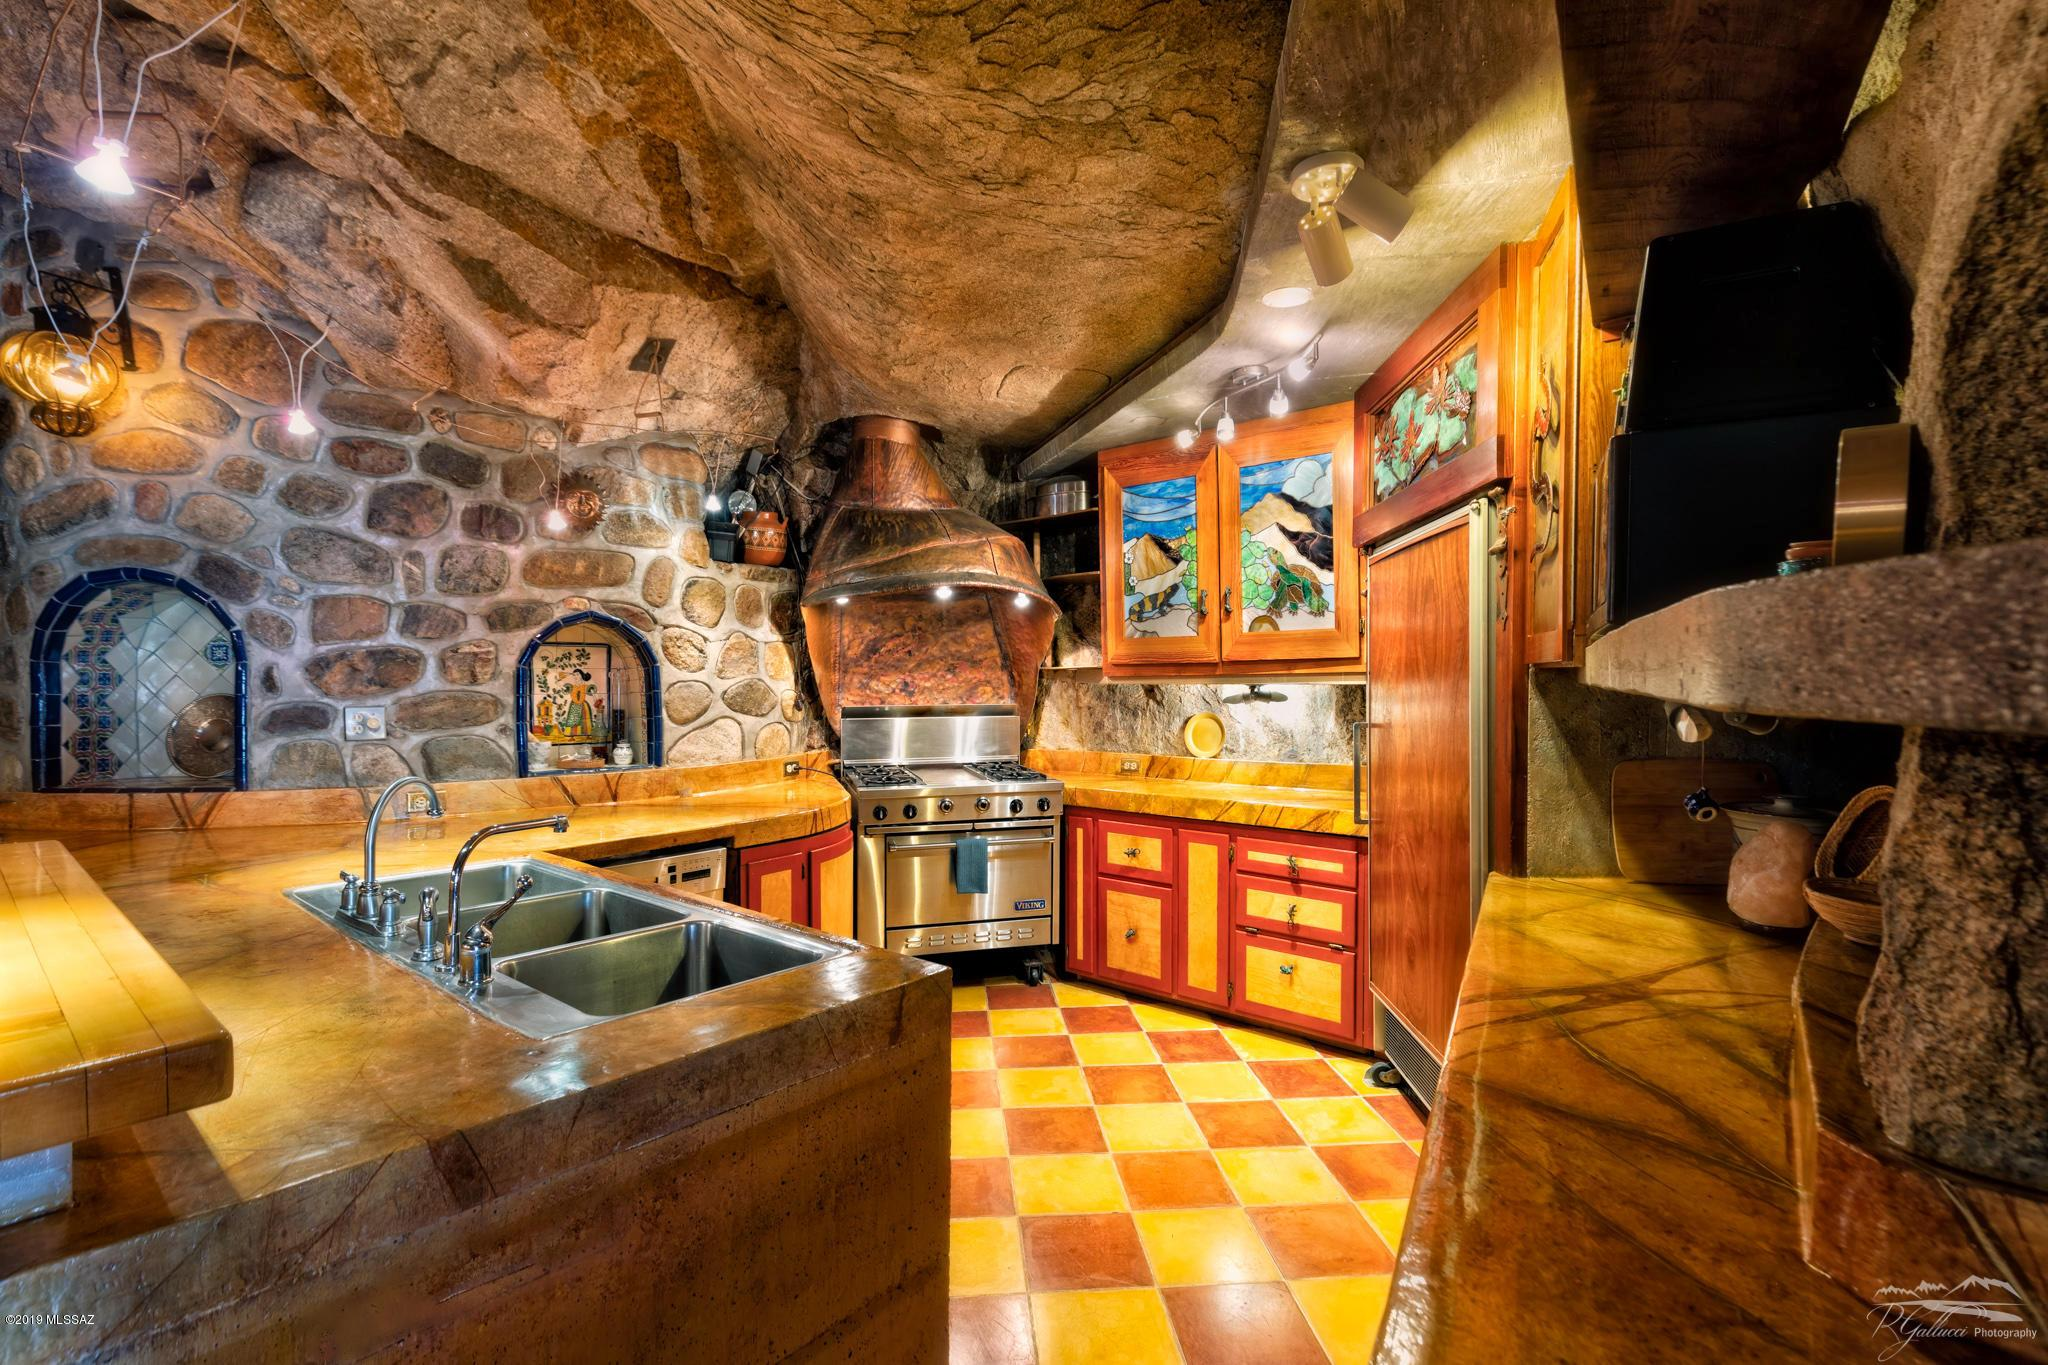 Cave home in Arizona